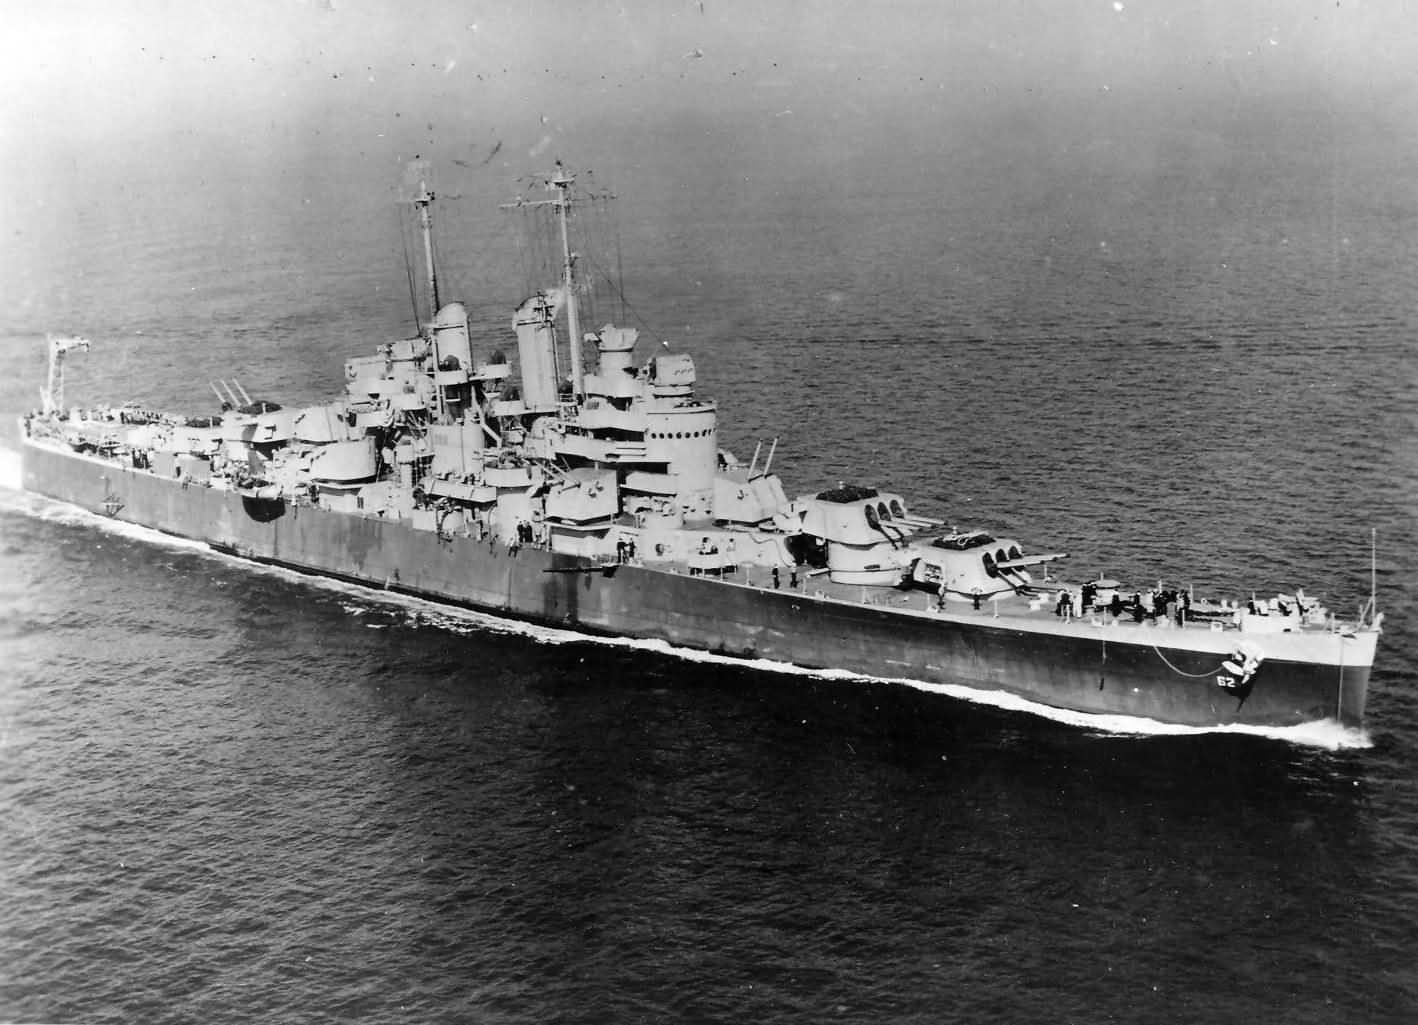 USS Birmingham CL-62 US Navy Light Cruiser